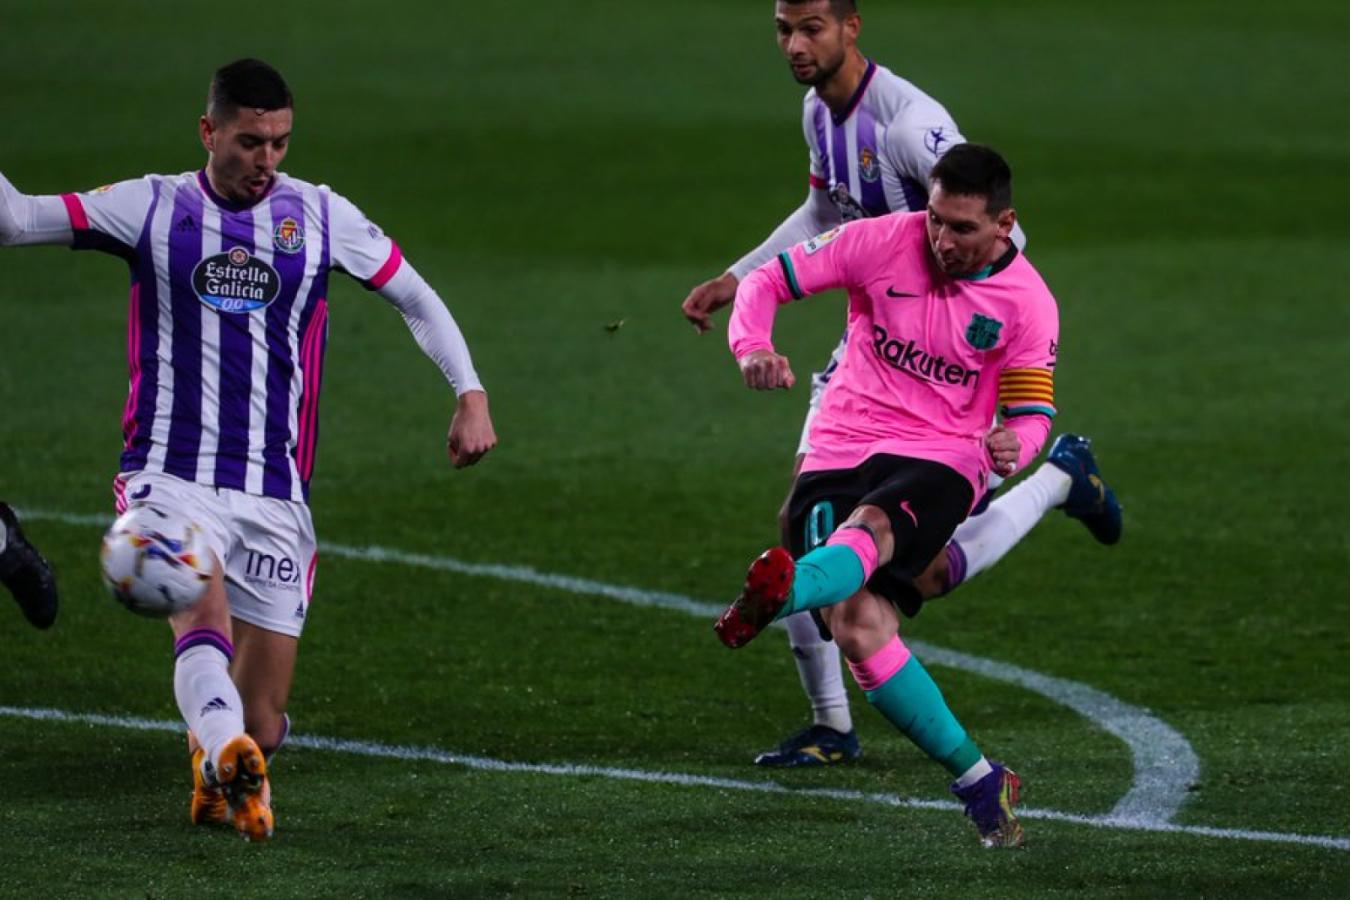 El momento exacto en el que Messi pasó a la historia